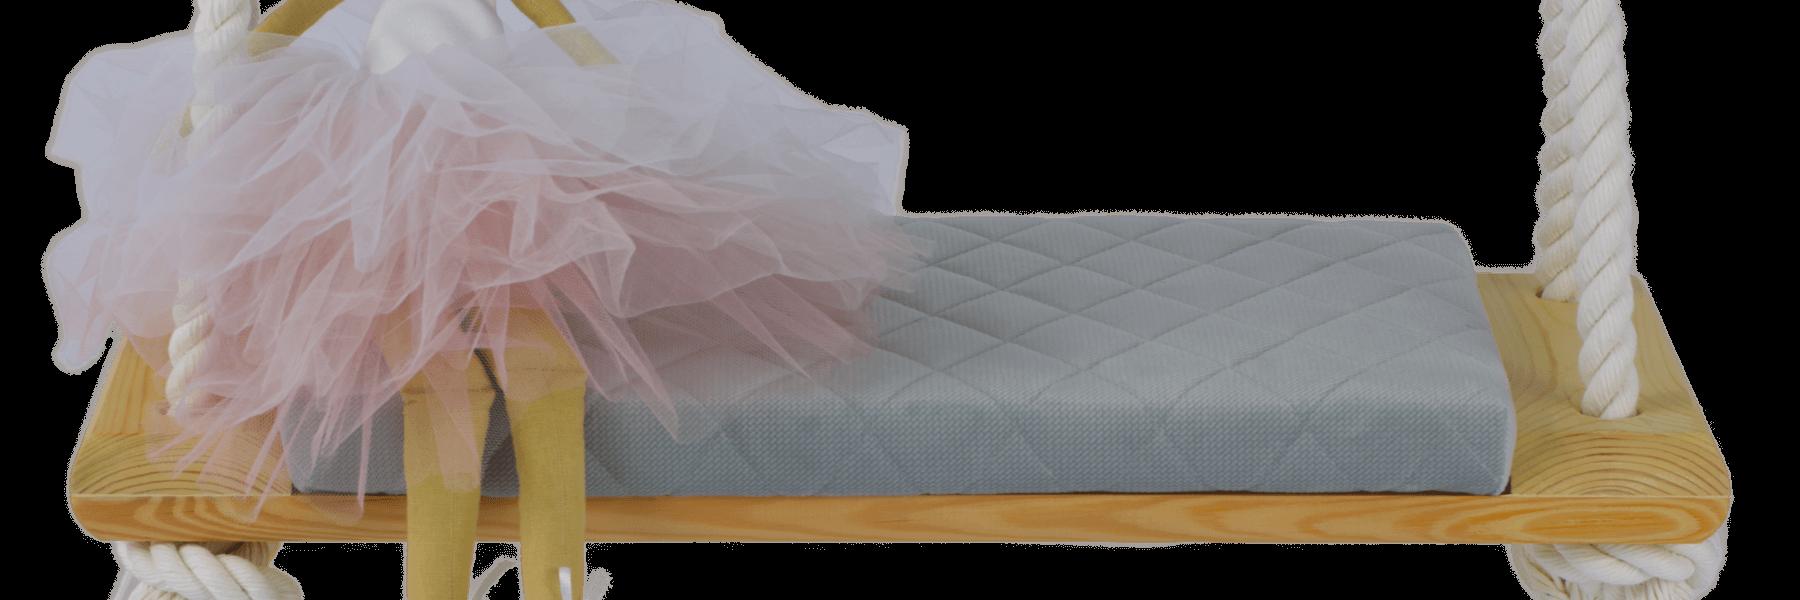 Columpio Comfort+ – Gris claro, Natural